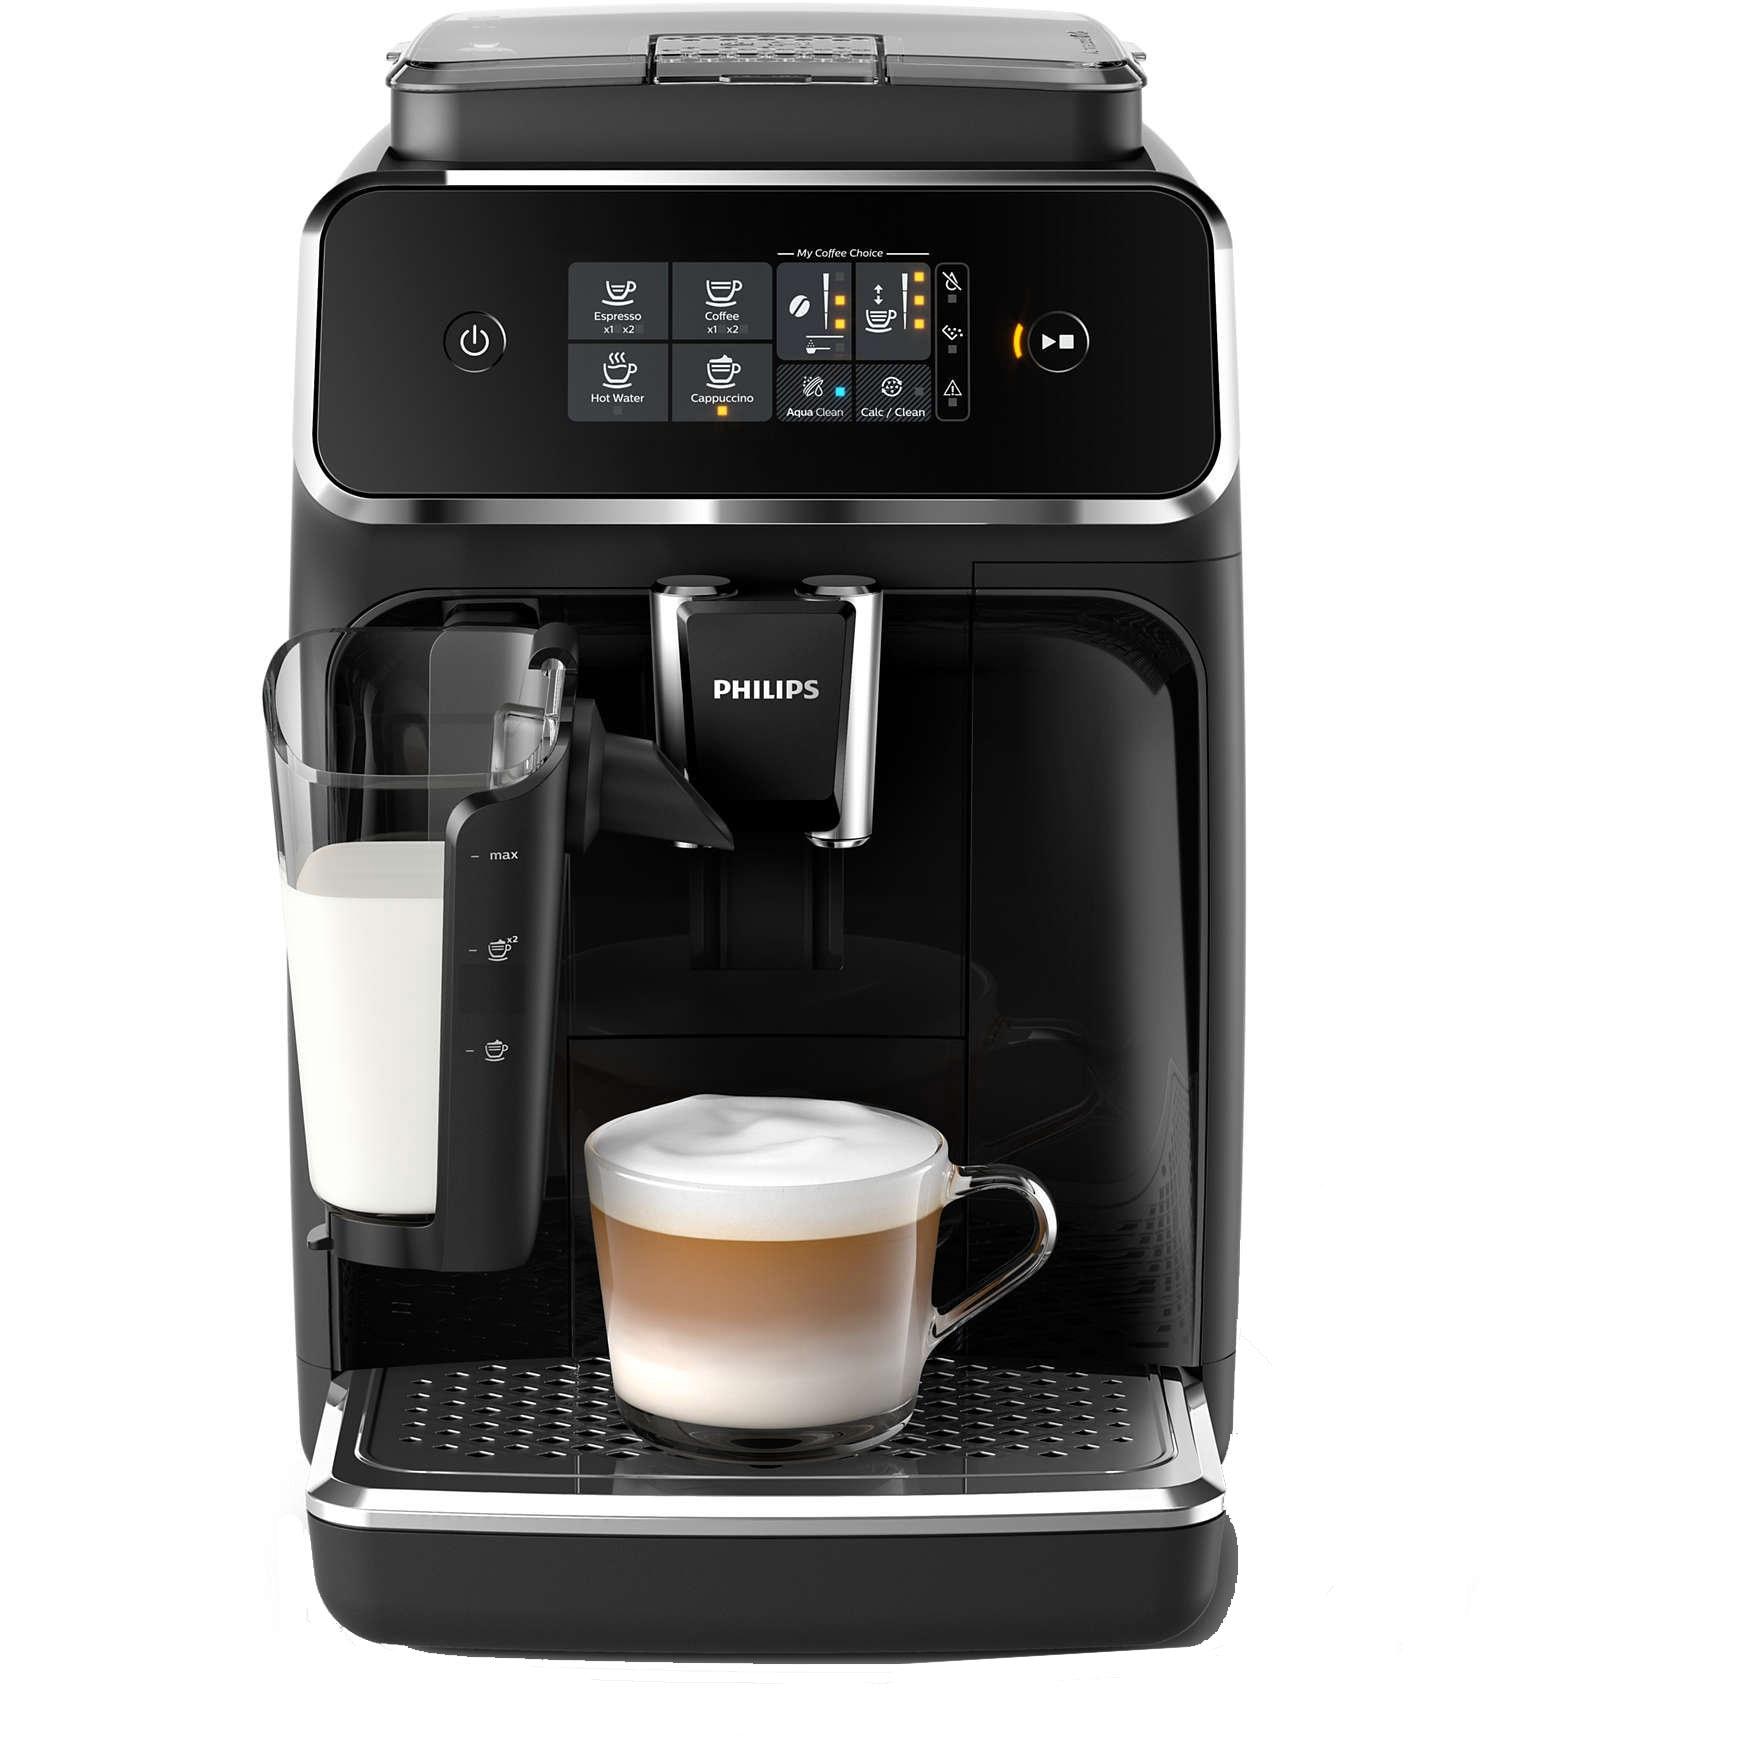 Fotografie Espressor automat Philips EP2231/40, sistem LatteGo, 3 bauturi, filtru AquaClean, rasnita ceramica, optiune cafea macinata, ecran tactil, Negru